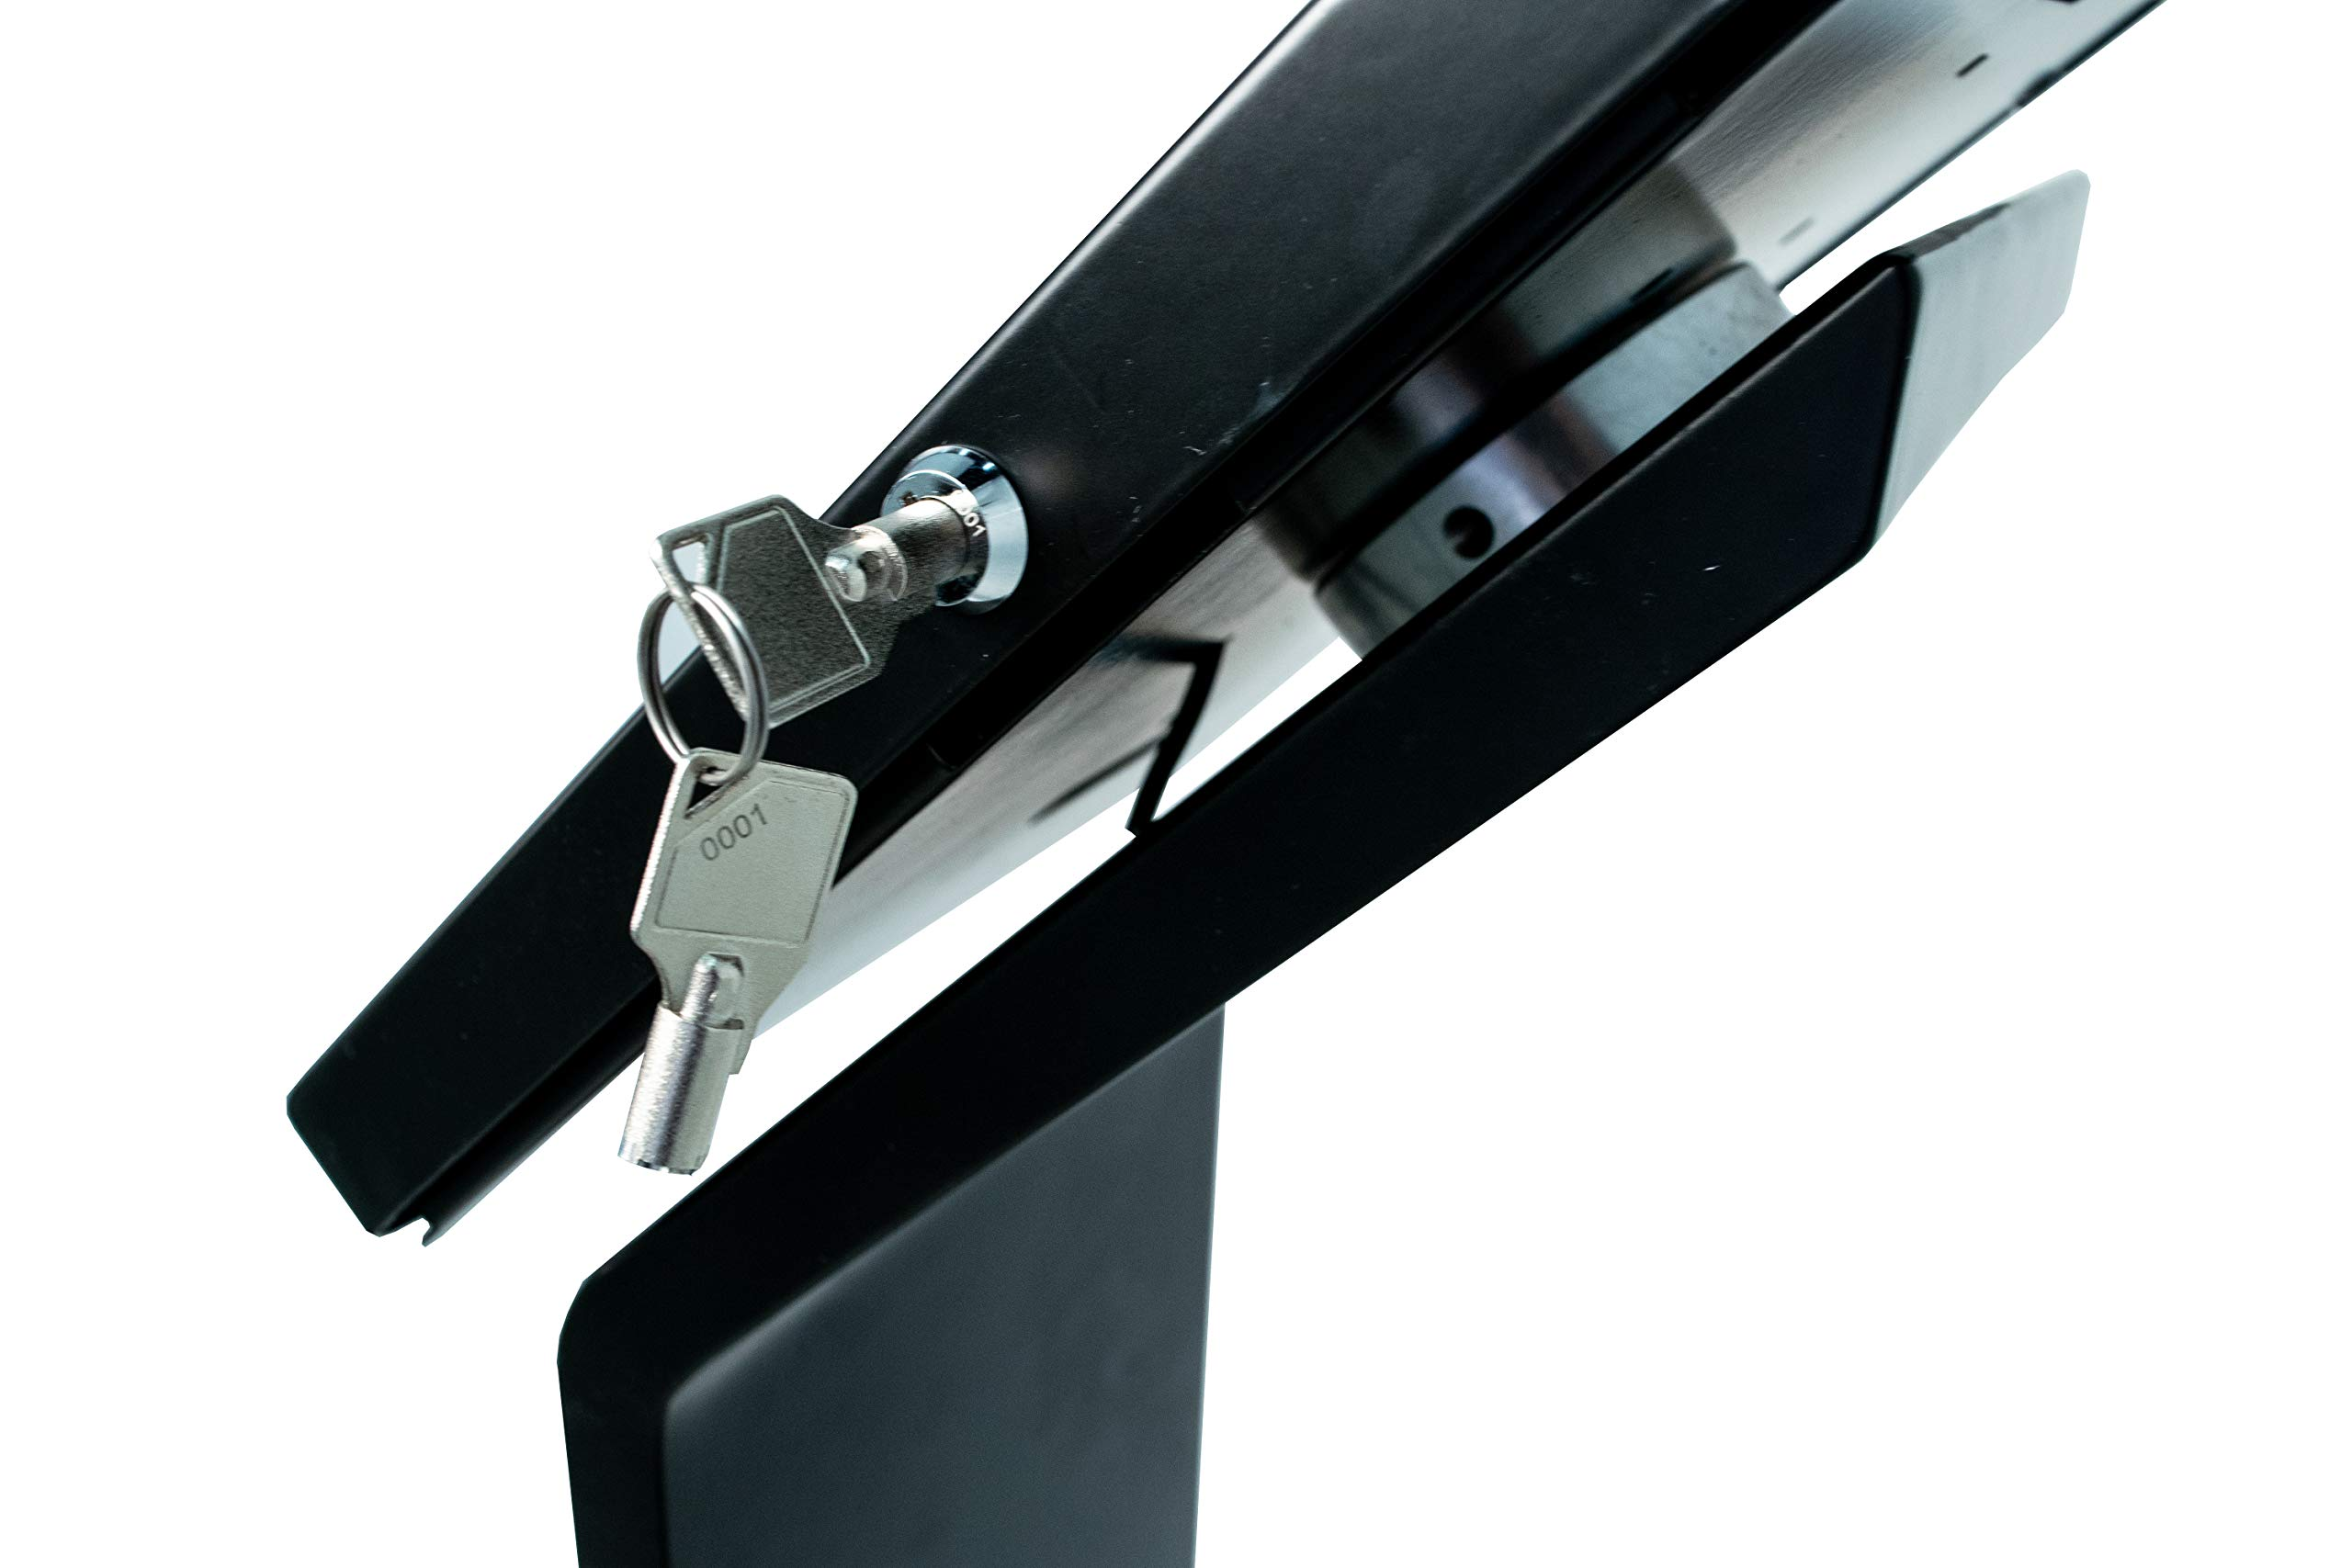 CTA Digital PAD-PARAF Premium Locking Floor Stand Kiosk for 11-inch iPad Pro/Air/Gen. 5-6 / Pro 10.5 / Galaxy Tab A 9.7'' / S2 9.7'' / 3 10.1'' / 4 10.1'' by CTA Digital (Image #4)